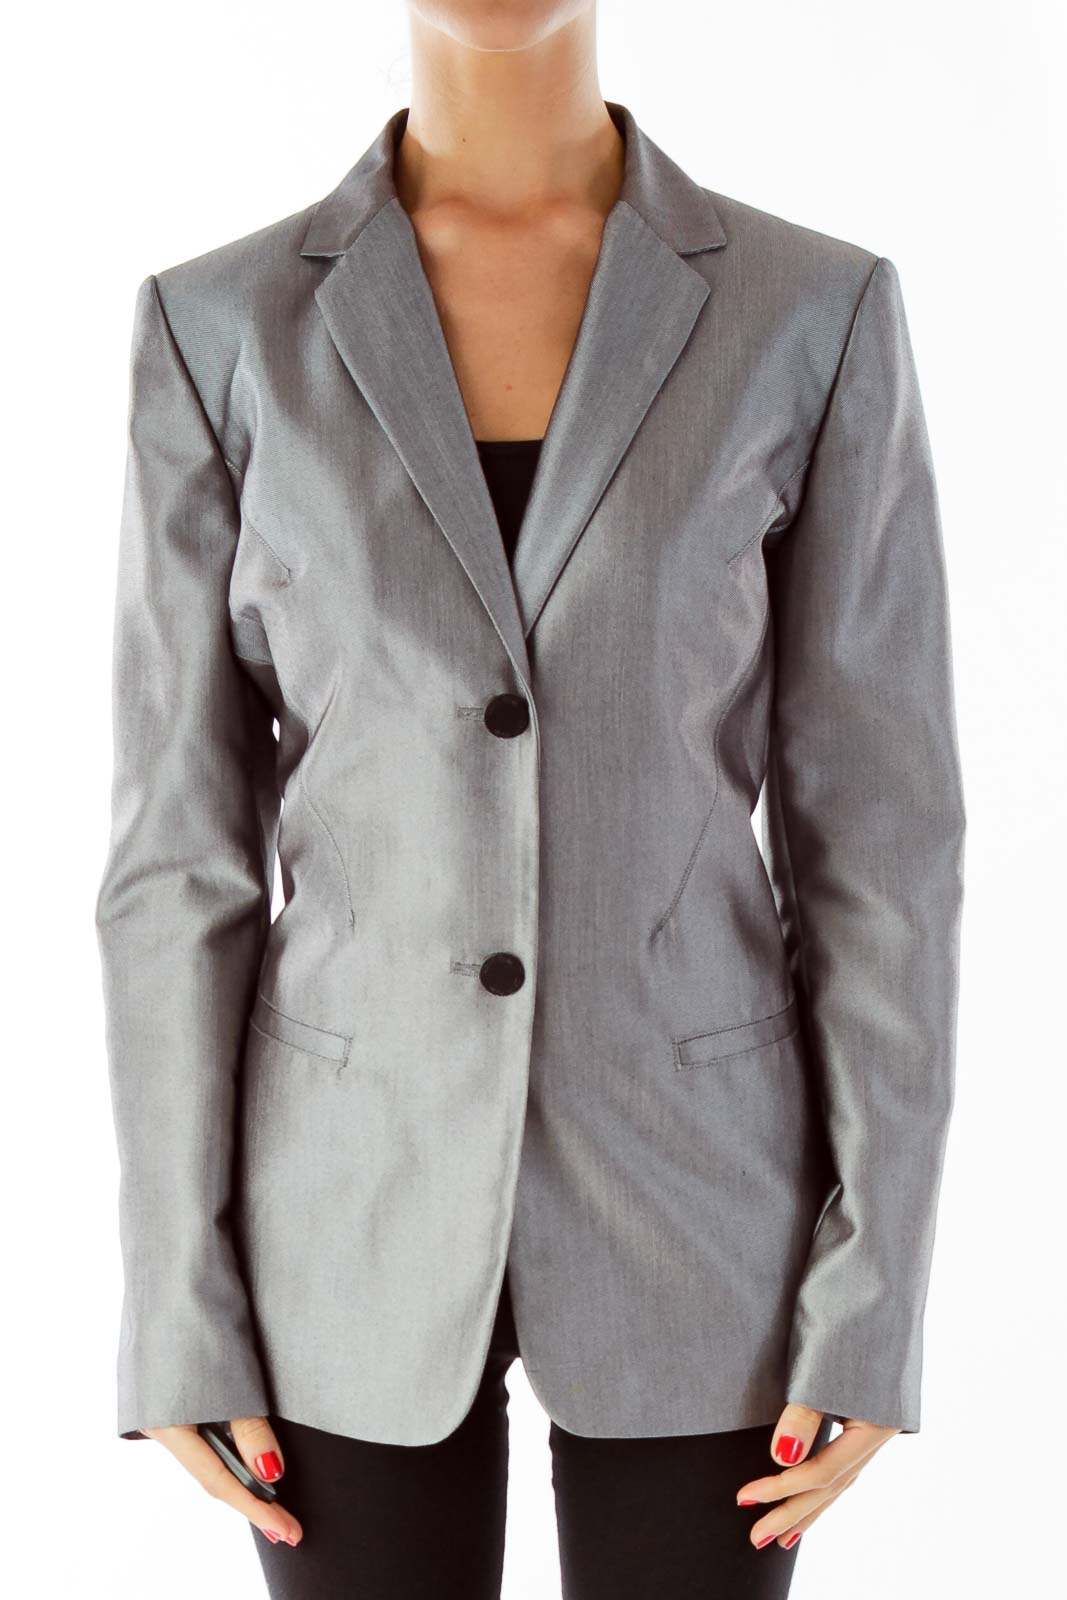 Silver Single-Breasted Blazer